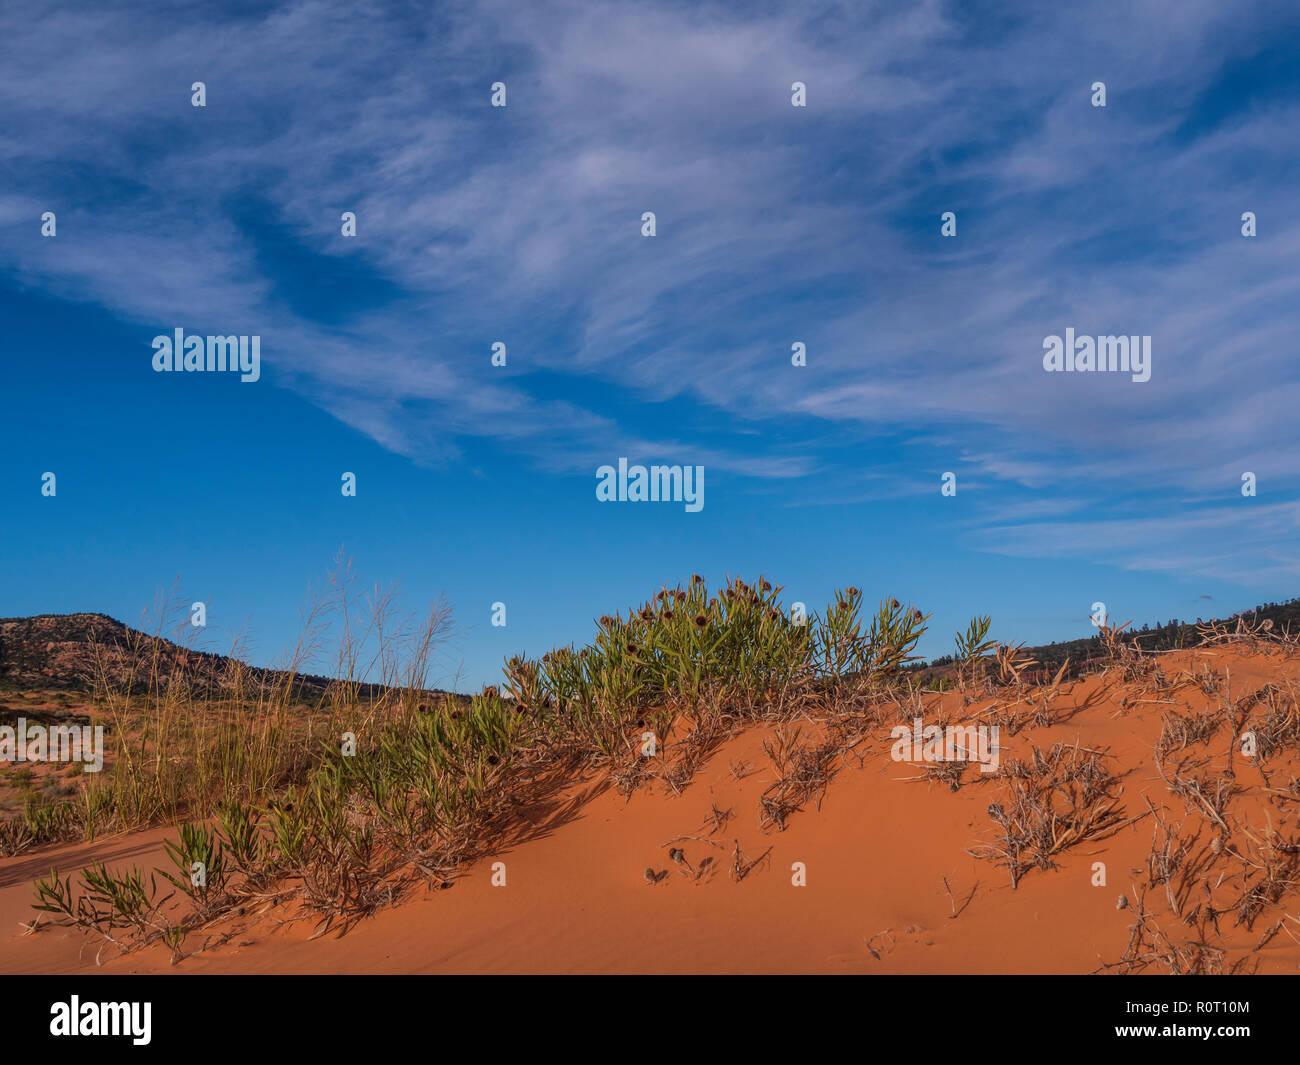 Rough Mulesears plant (Wyethia cabra attenuata), Coral Pink Sand Dunes State Park, Kanab, Utah. - Stock Image